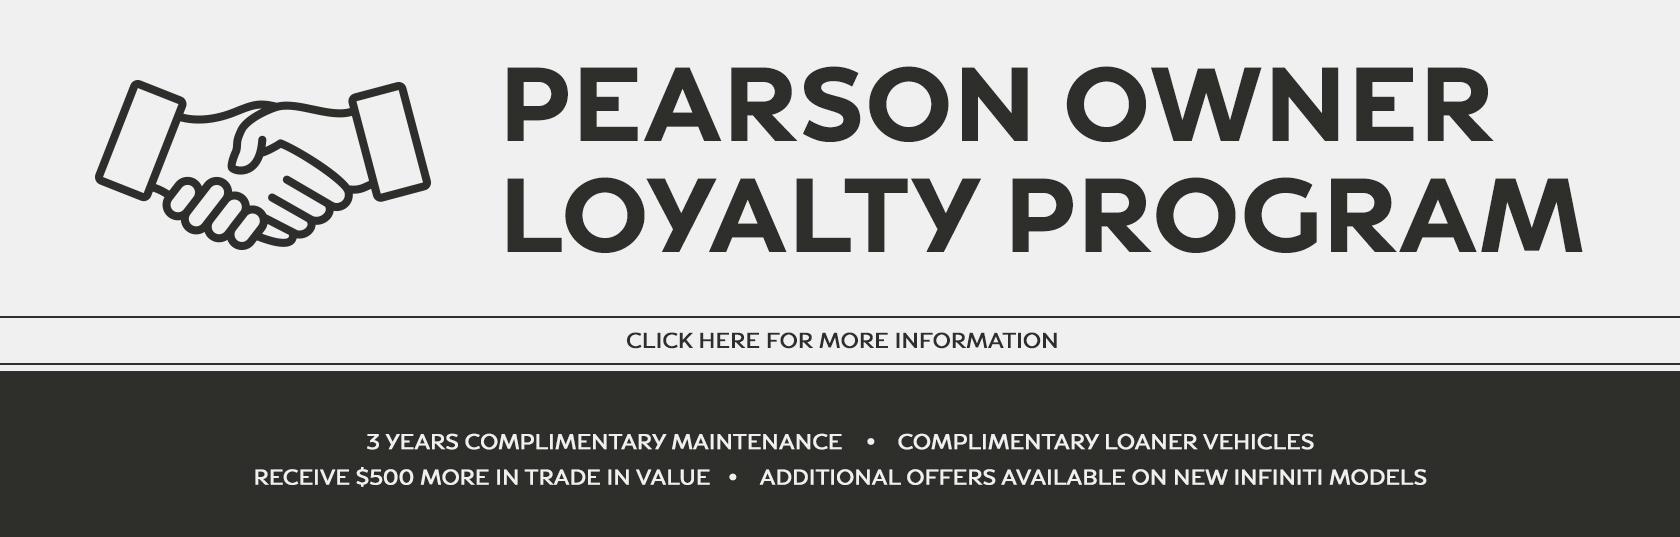 Pearson Loyalty Program